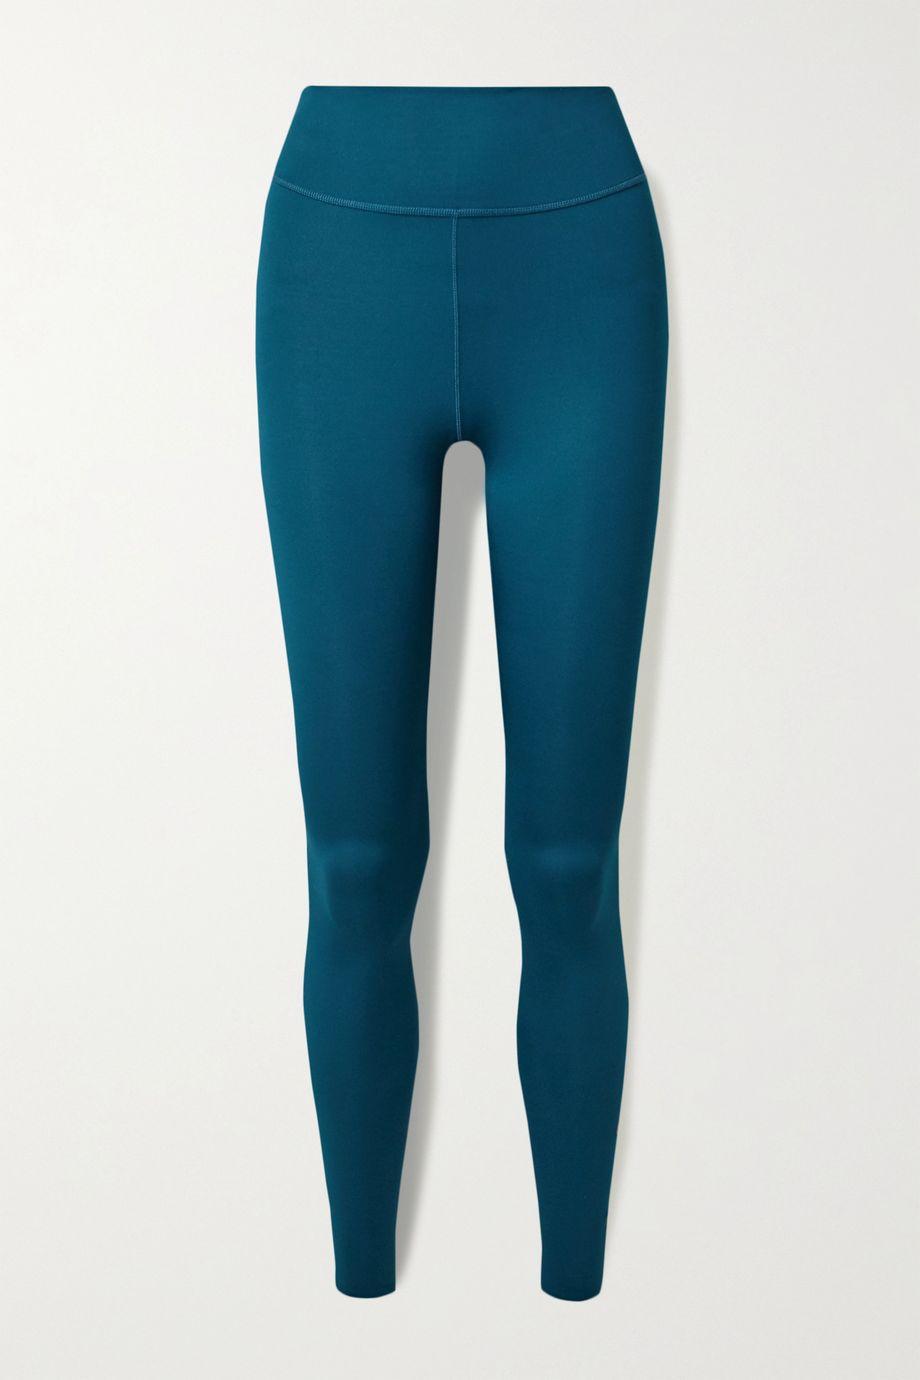 Nike One Luxe Dri-FIT leggings